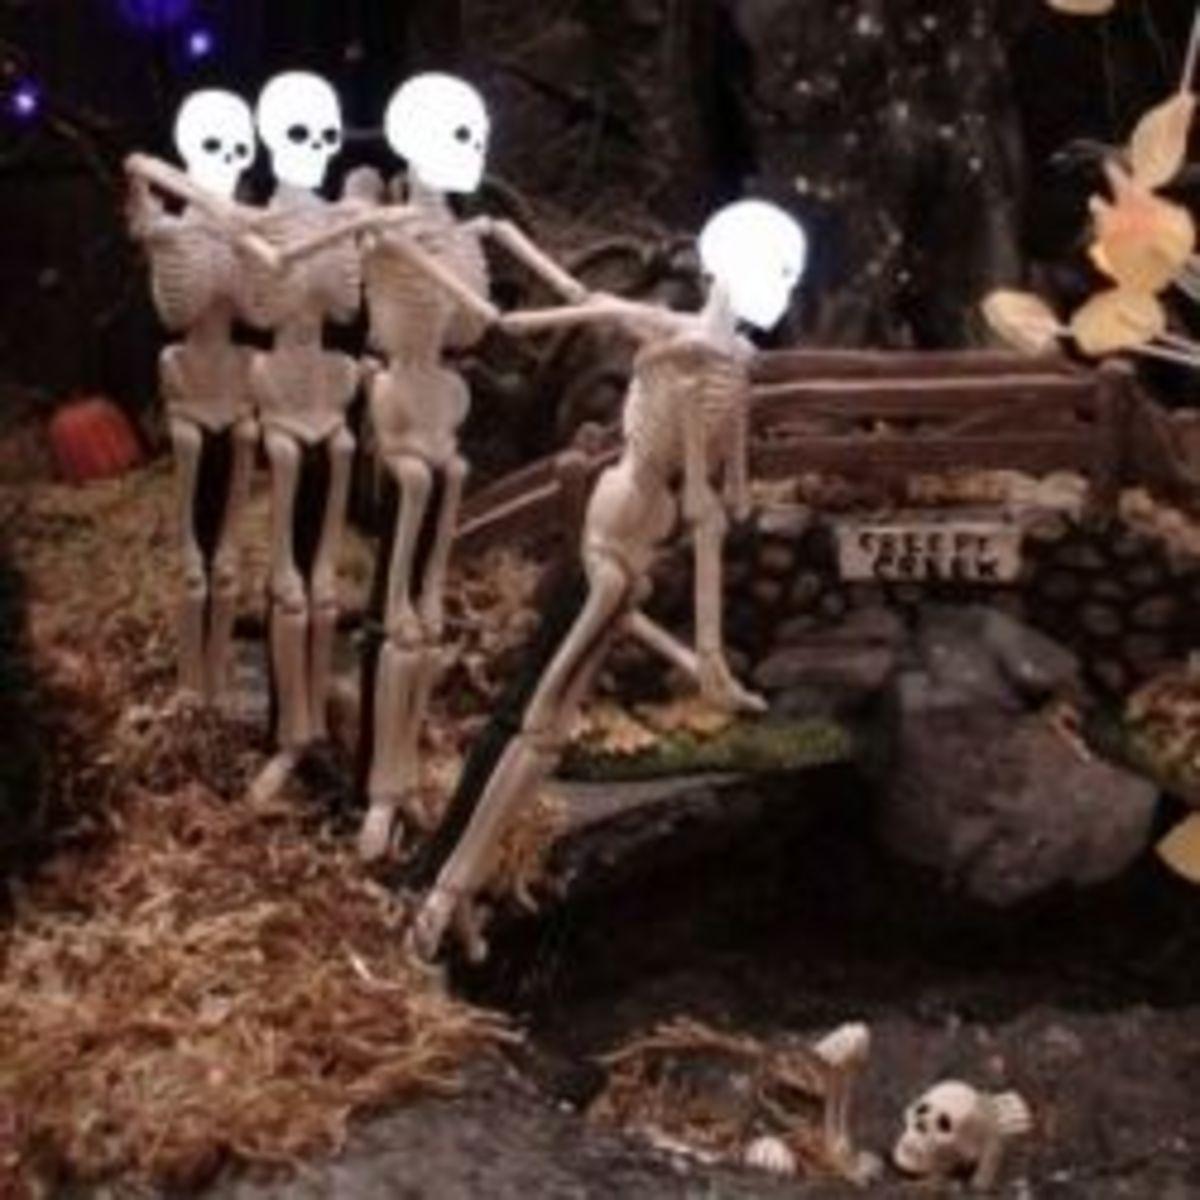 Skeletons in a Halloween village